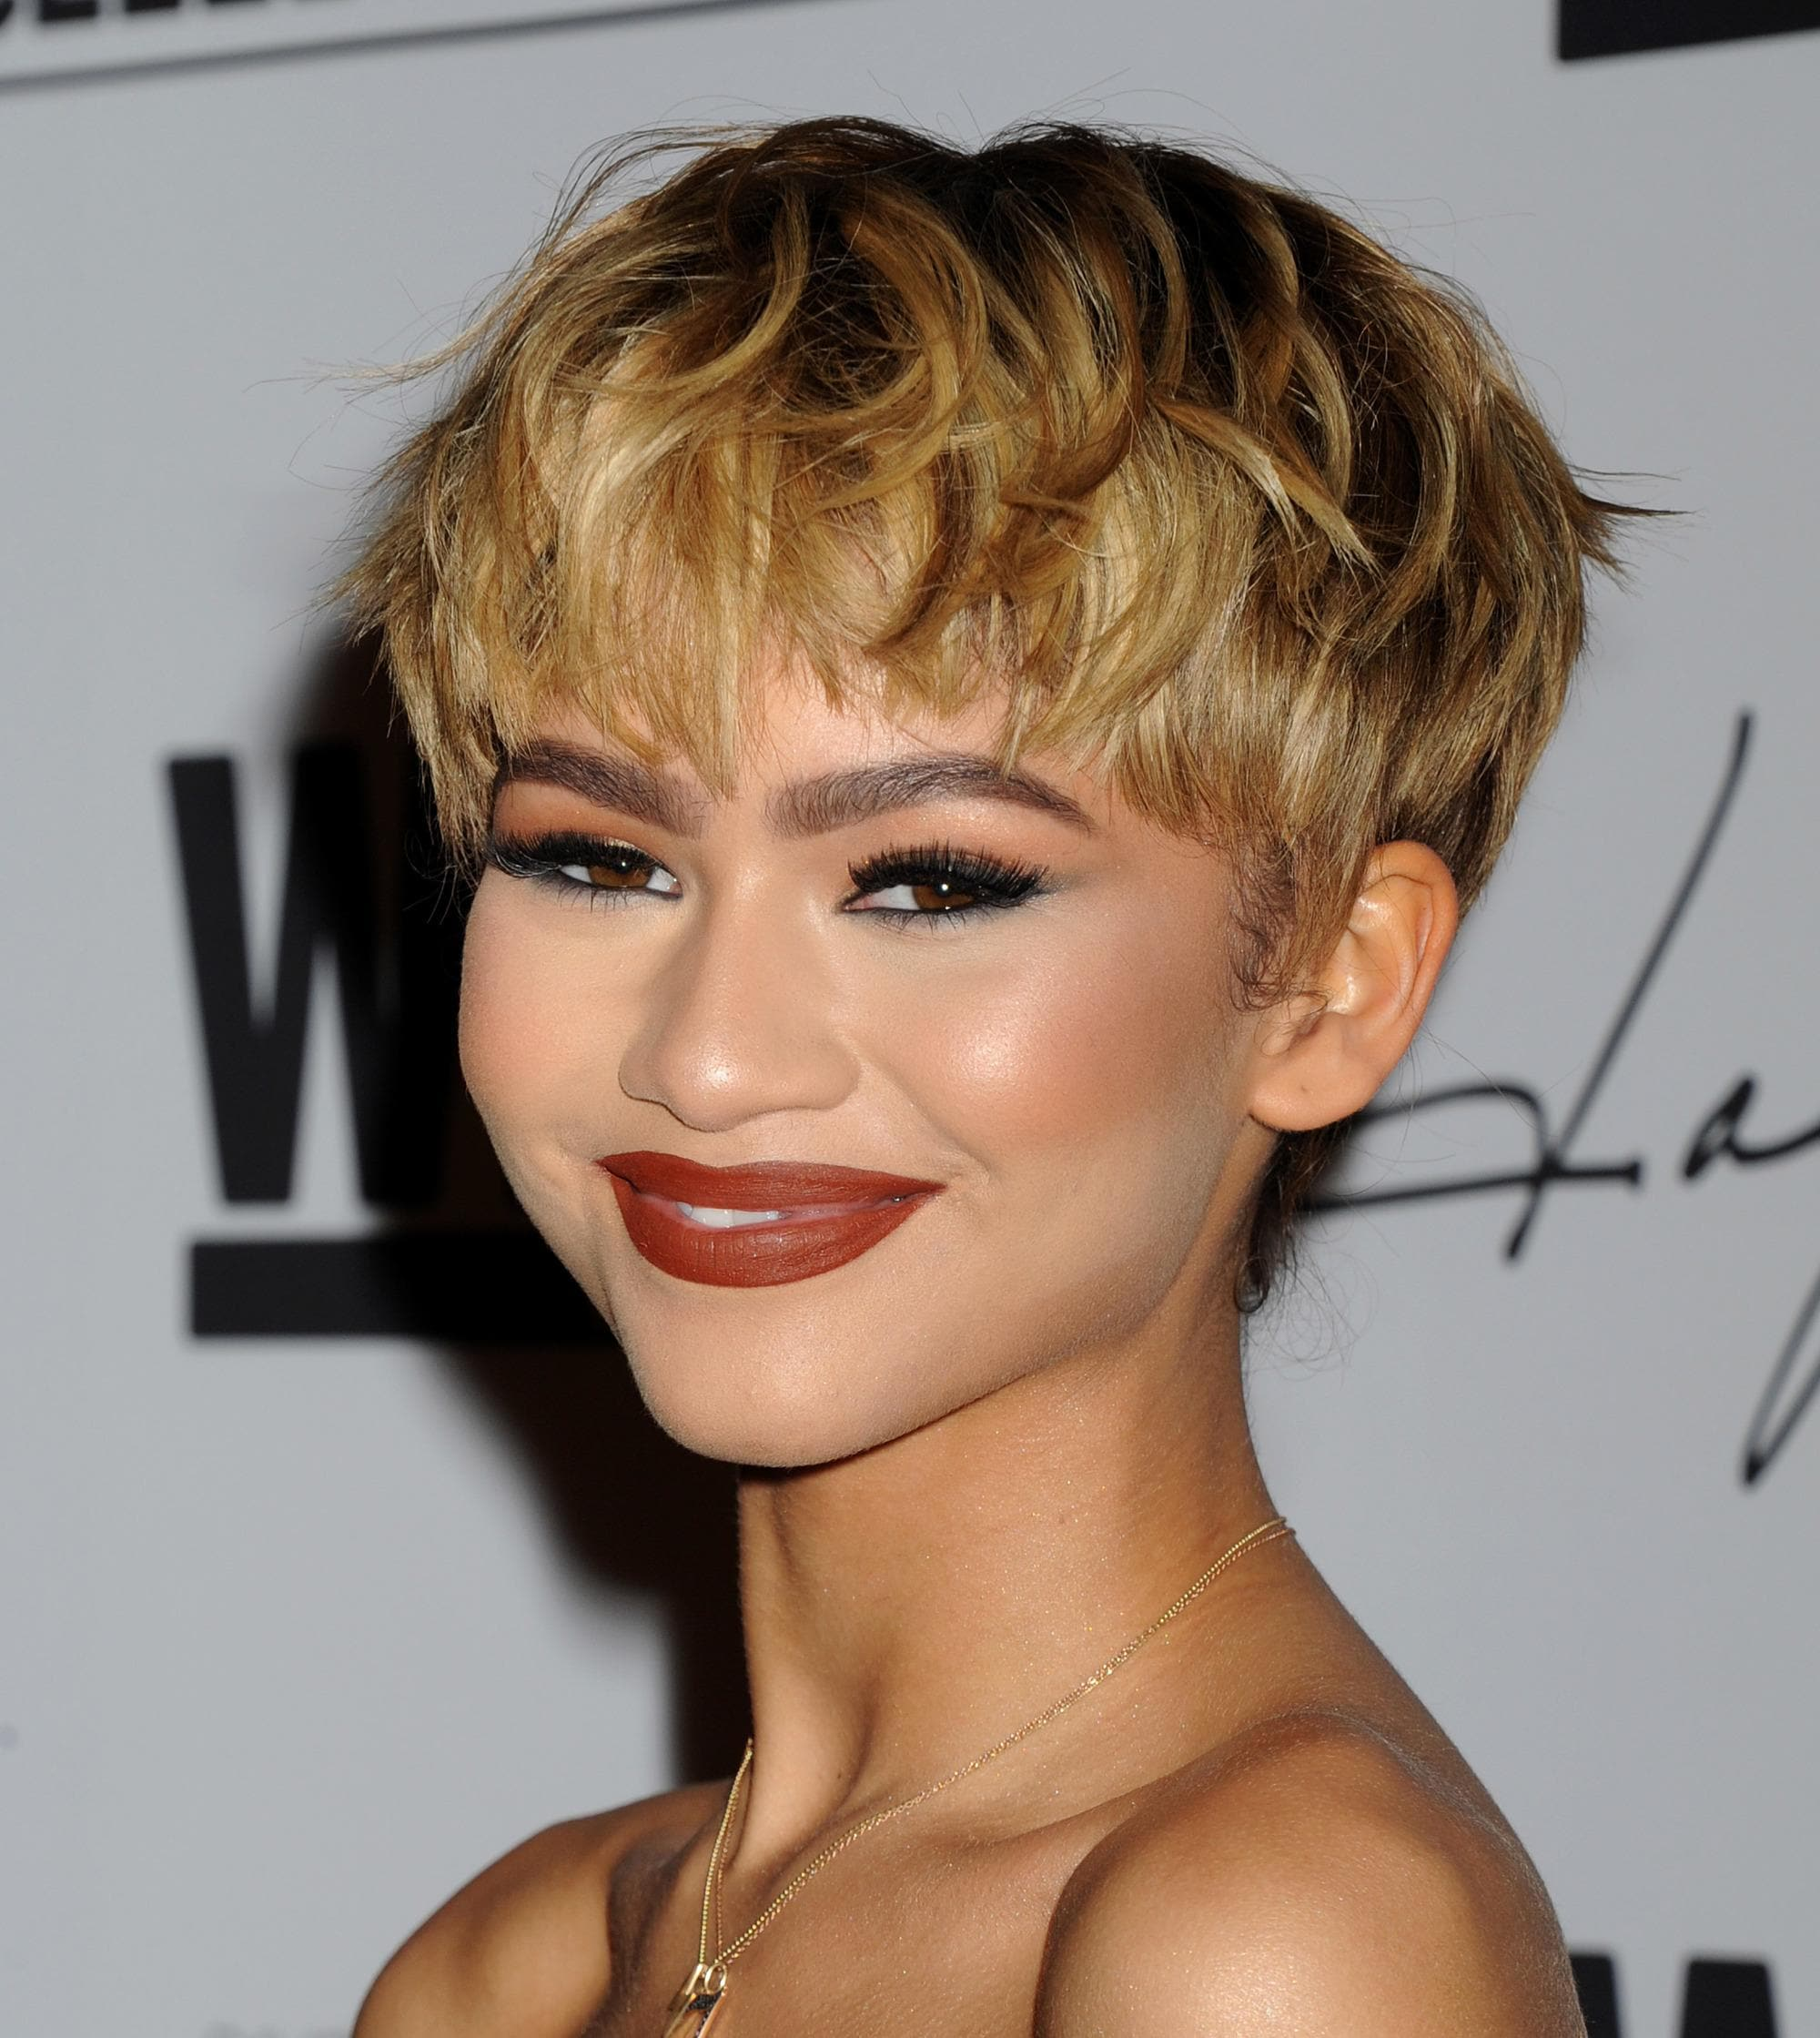 Zendaya with blonde mushroom haircut